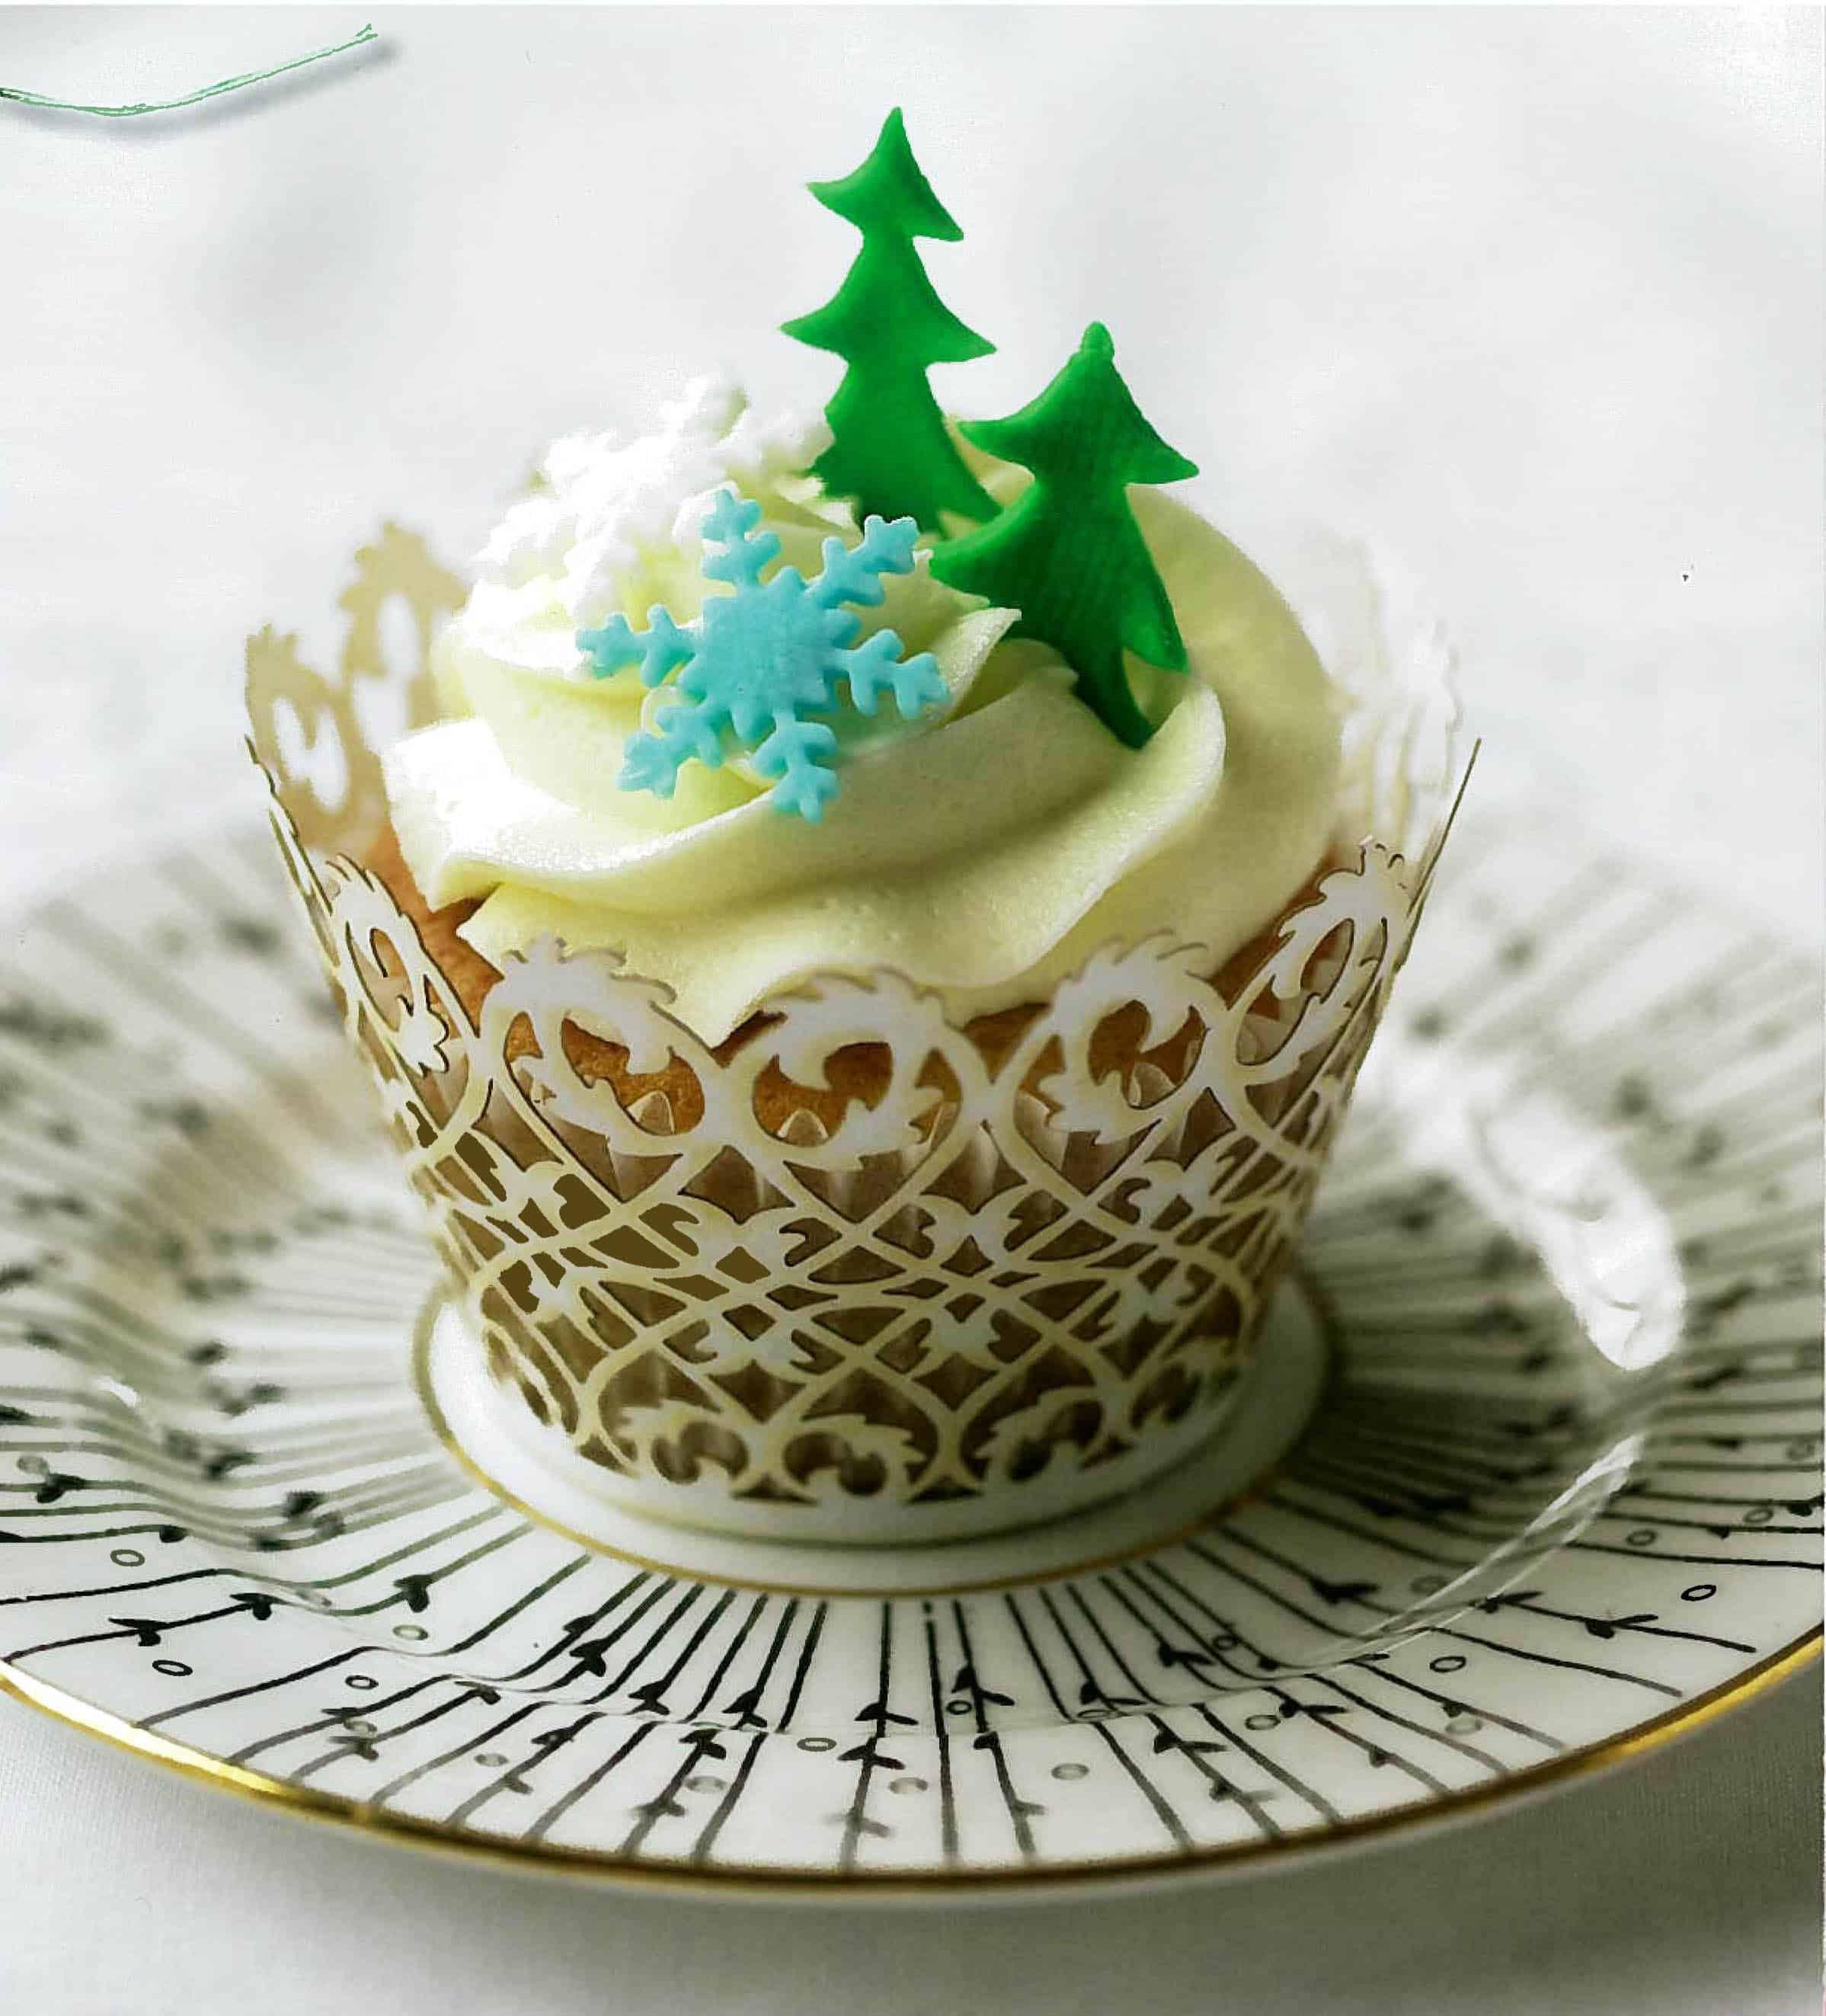 Elegant fondant cut-out Christmas cupcakes